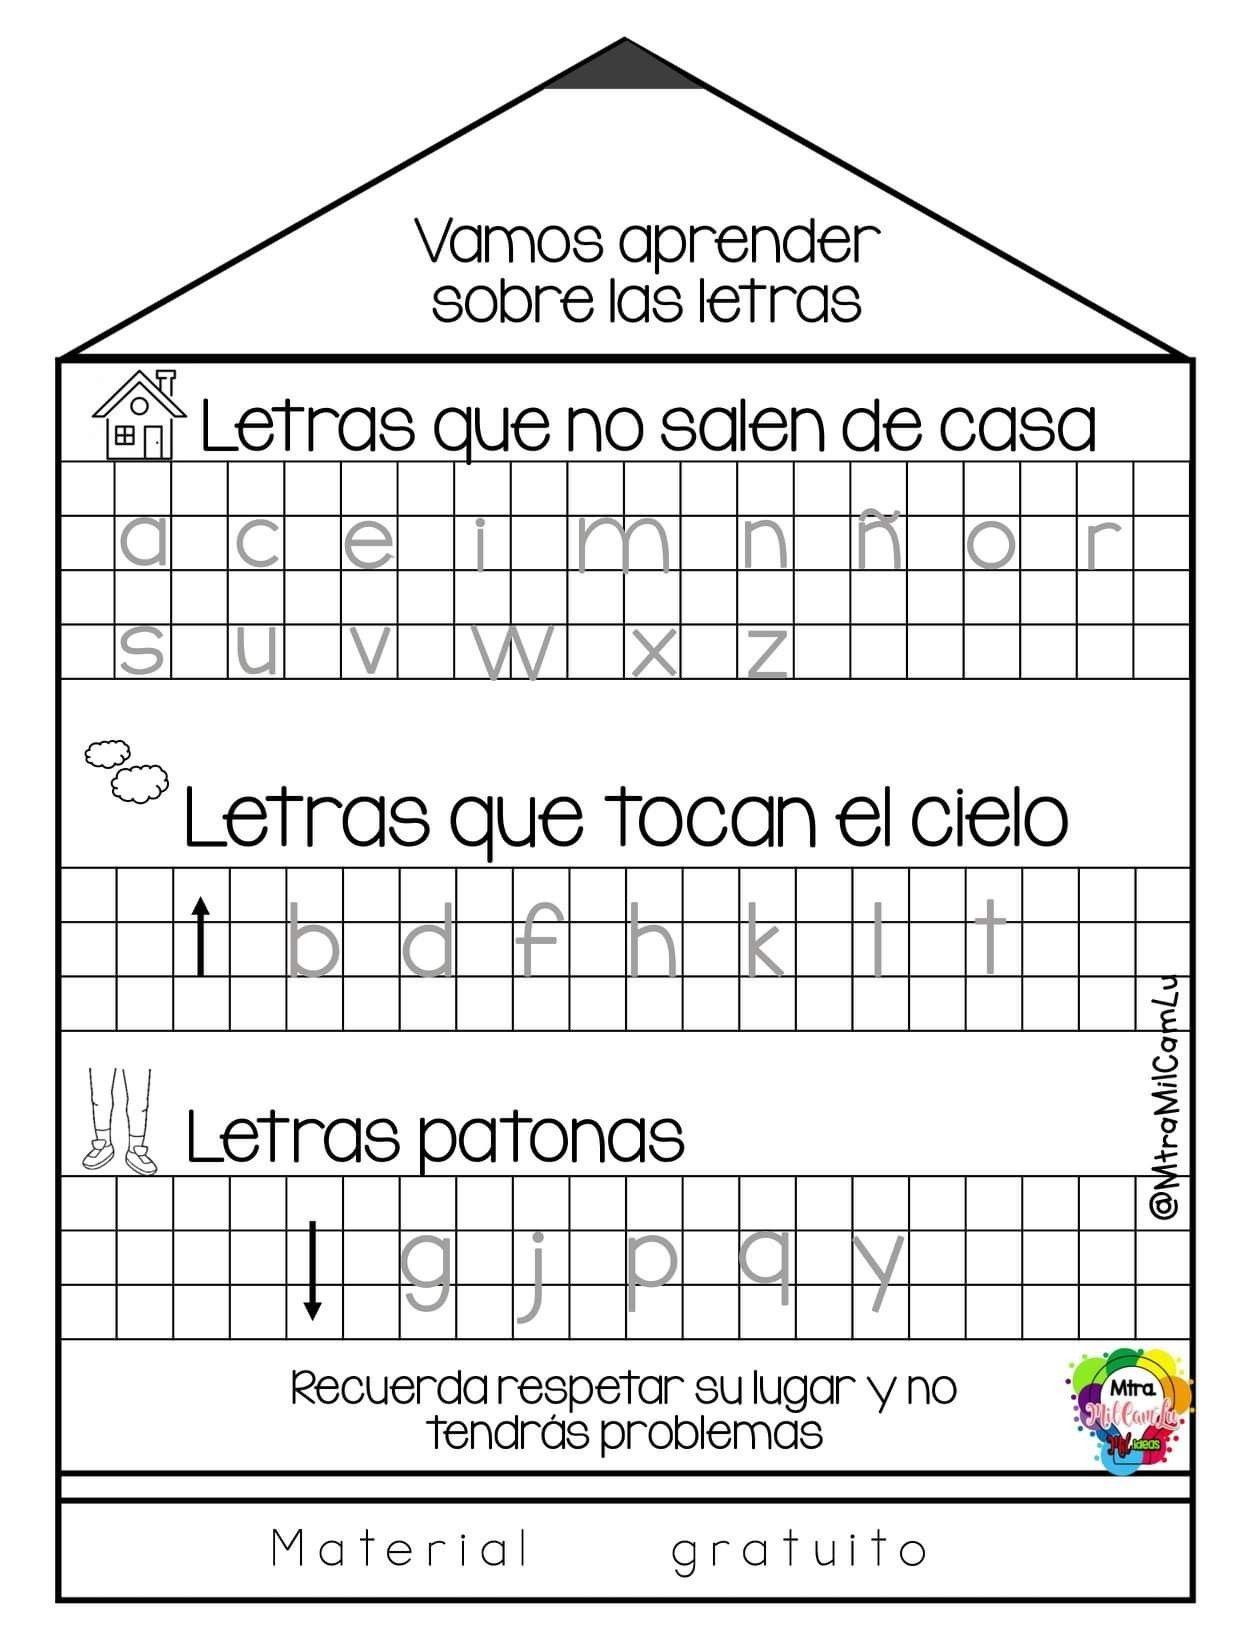 Pin De Belen D Leon En Material De Apoyo Estrategias De Escritura Ensenanza De Las Letras Actividades De Escritura